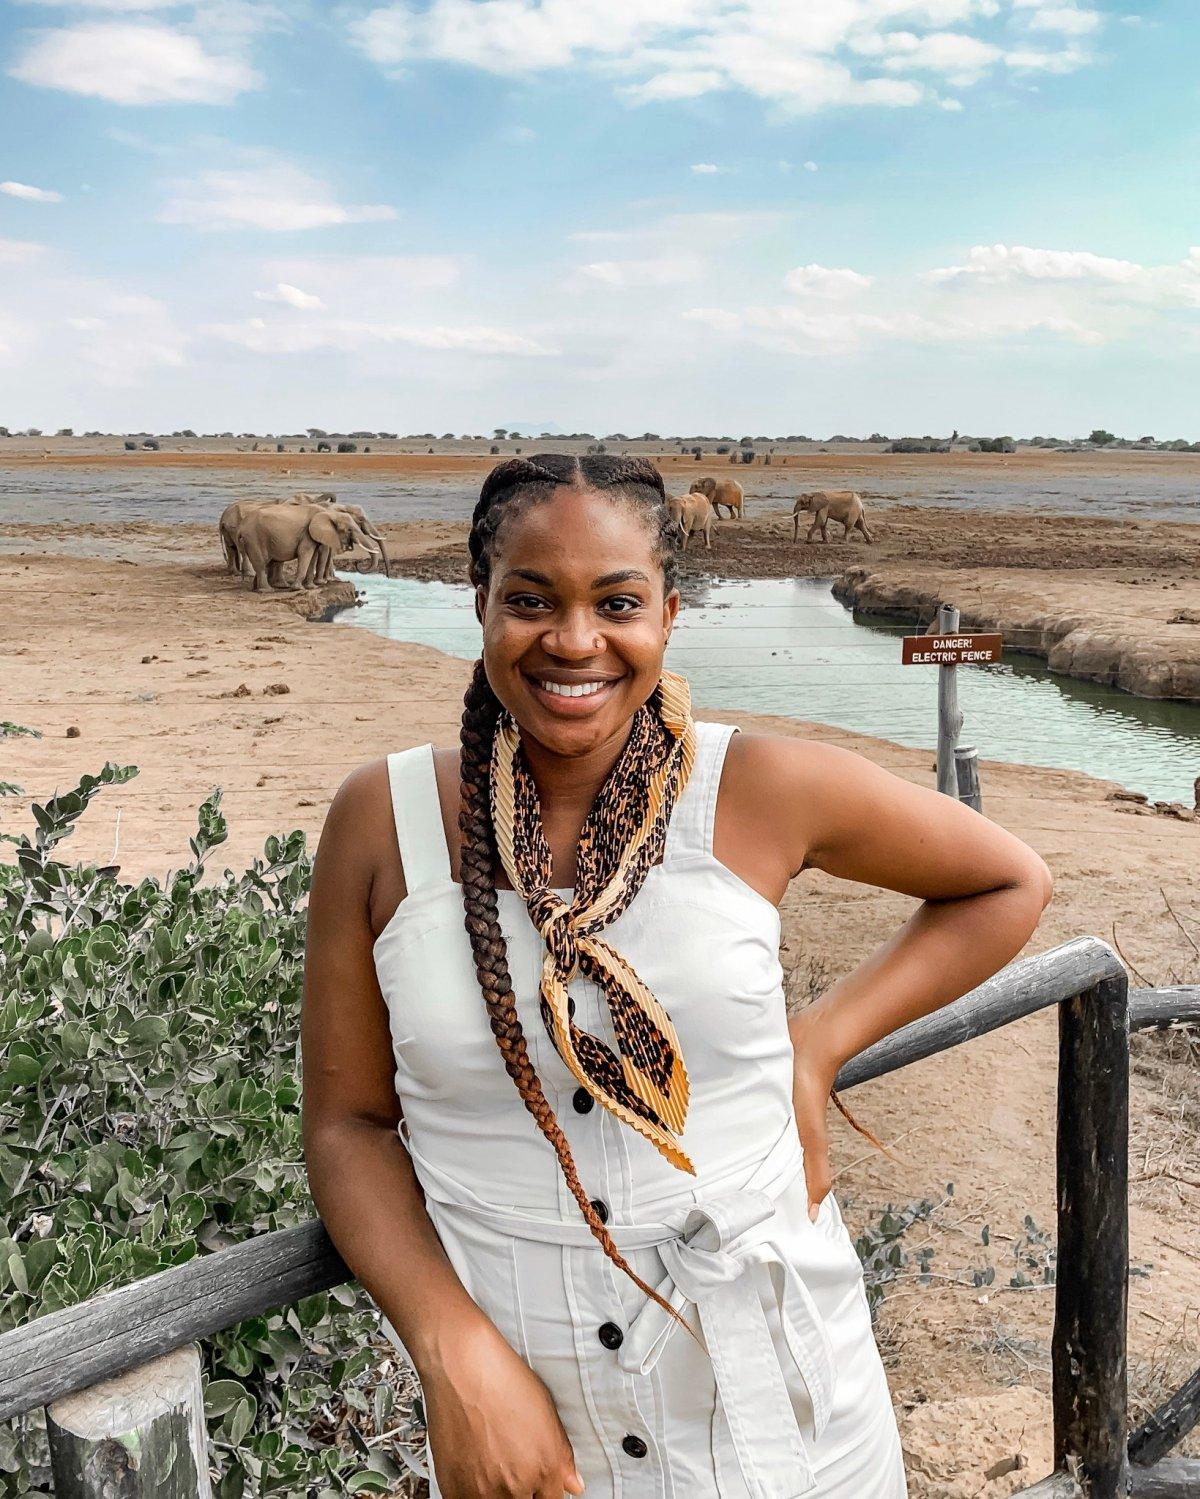 Ijeoma Kola at Tsavo East National Park